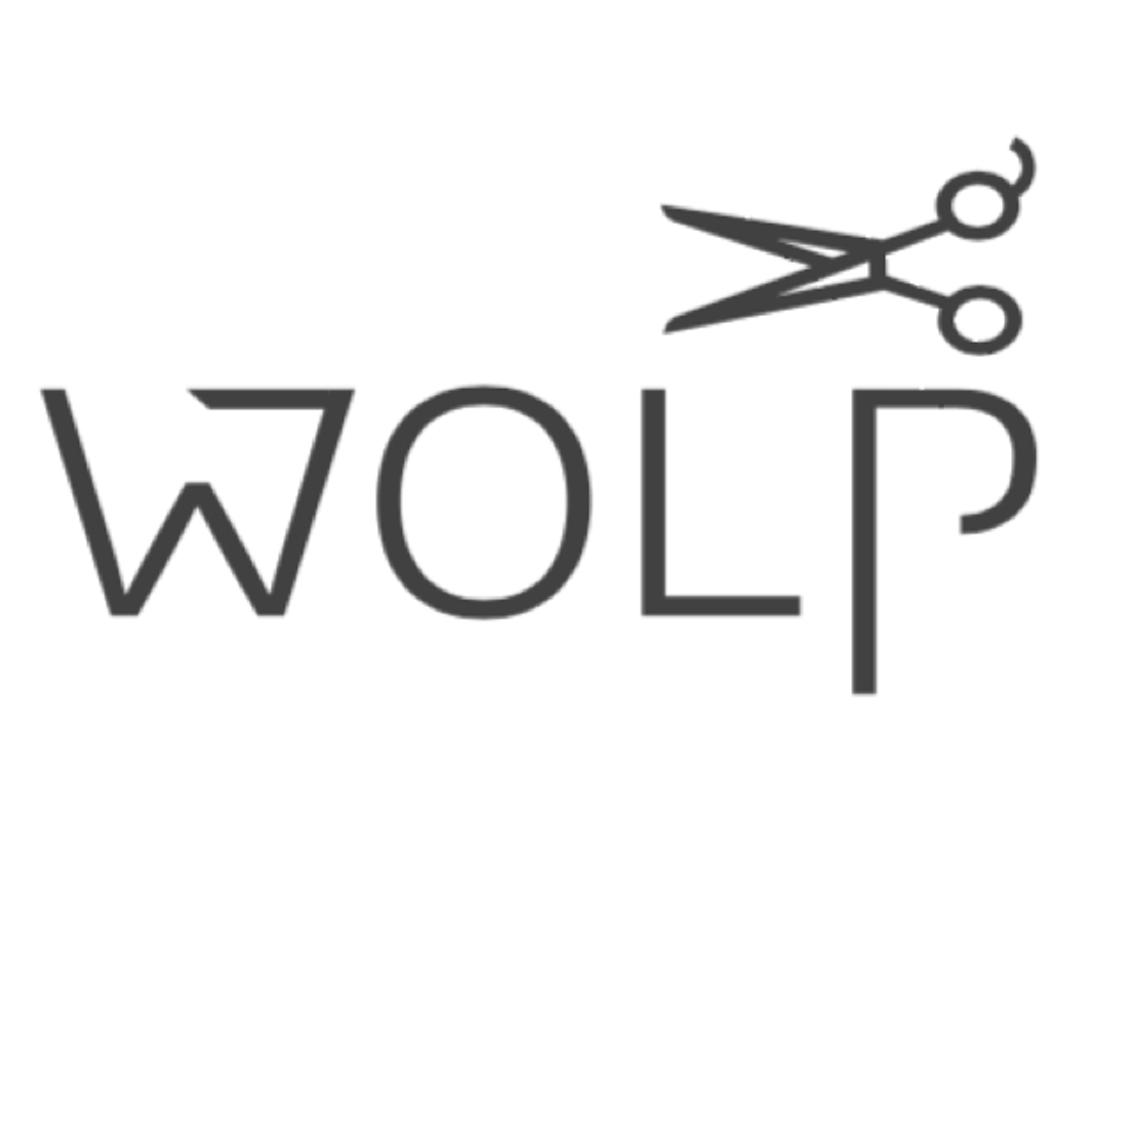 Wolp(ワルプ)所属・Wolp(ワルプ)の掲載